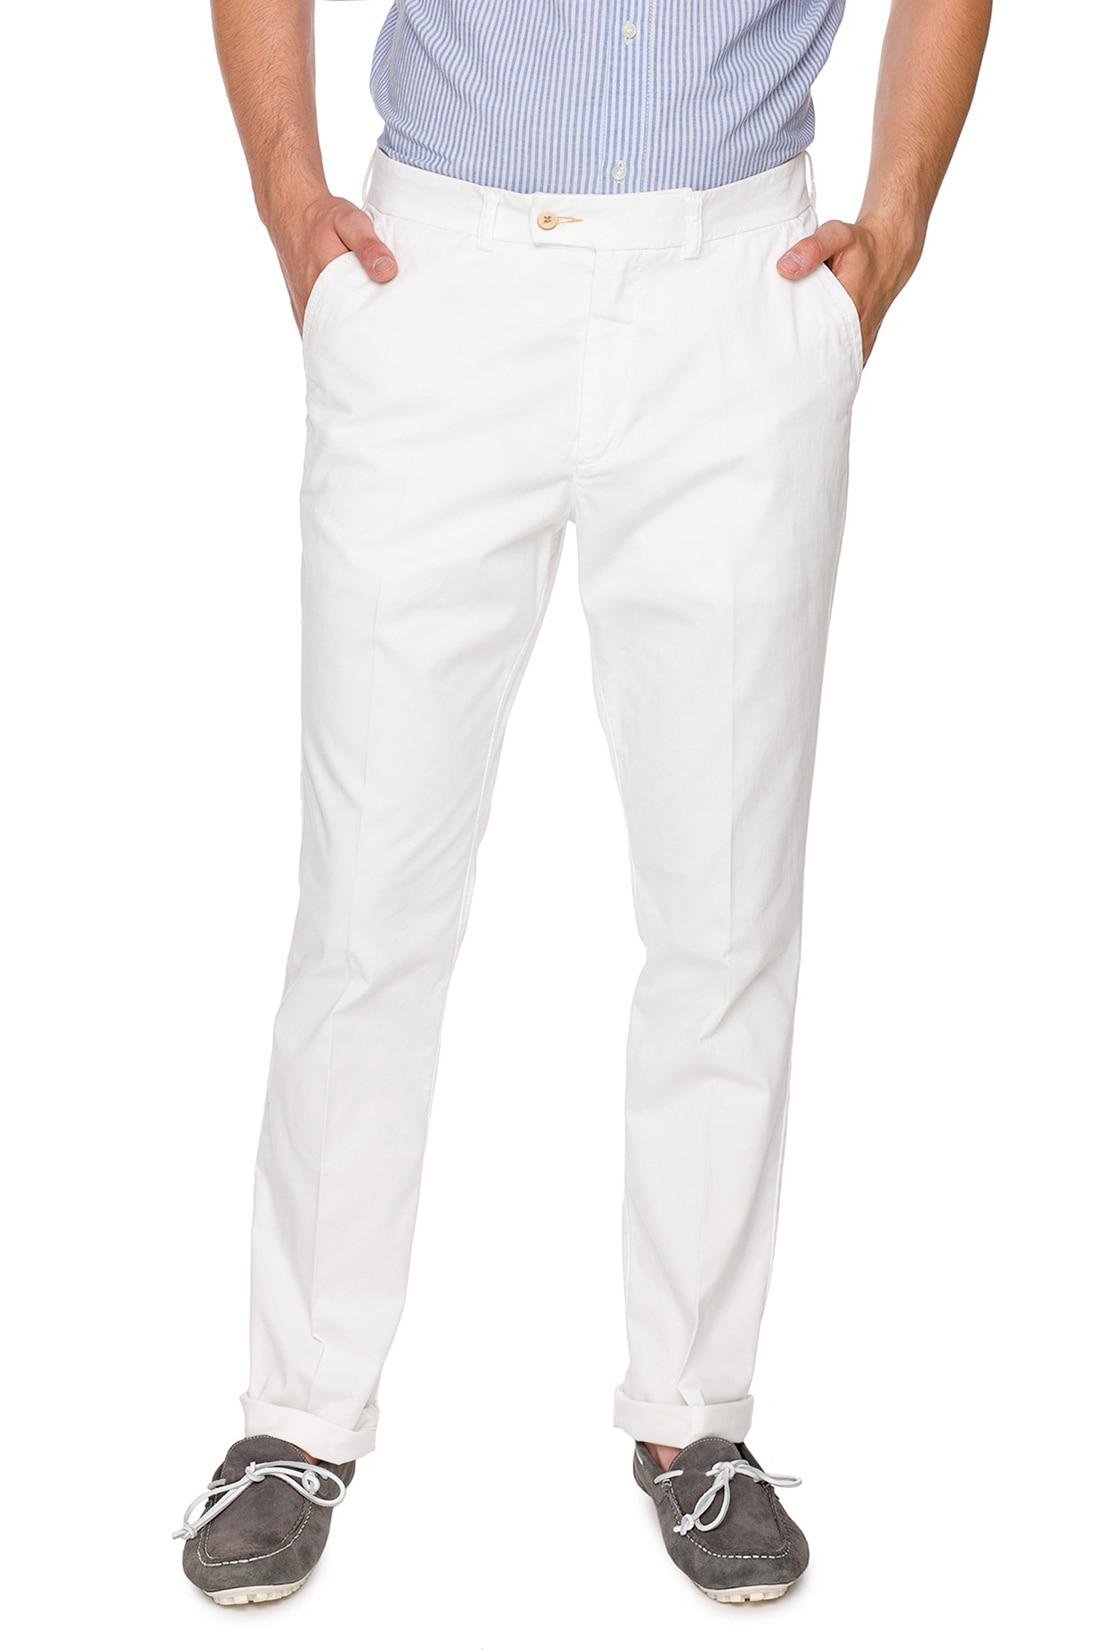 ROY fehér férfi office nadrág, 50 eMAG.hu